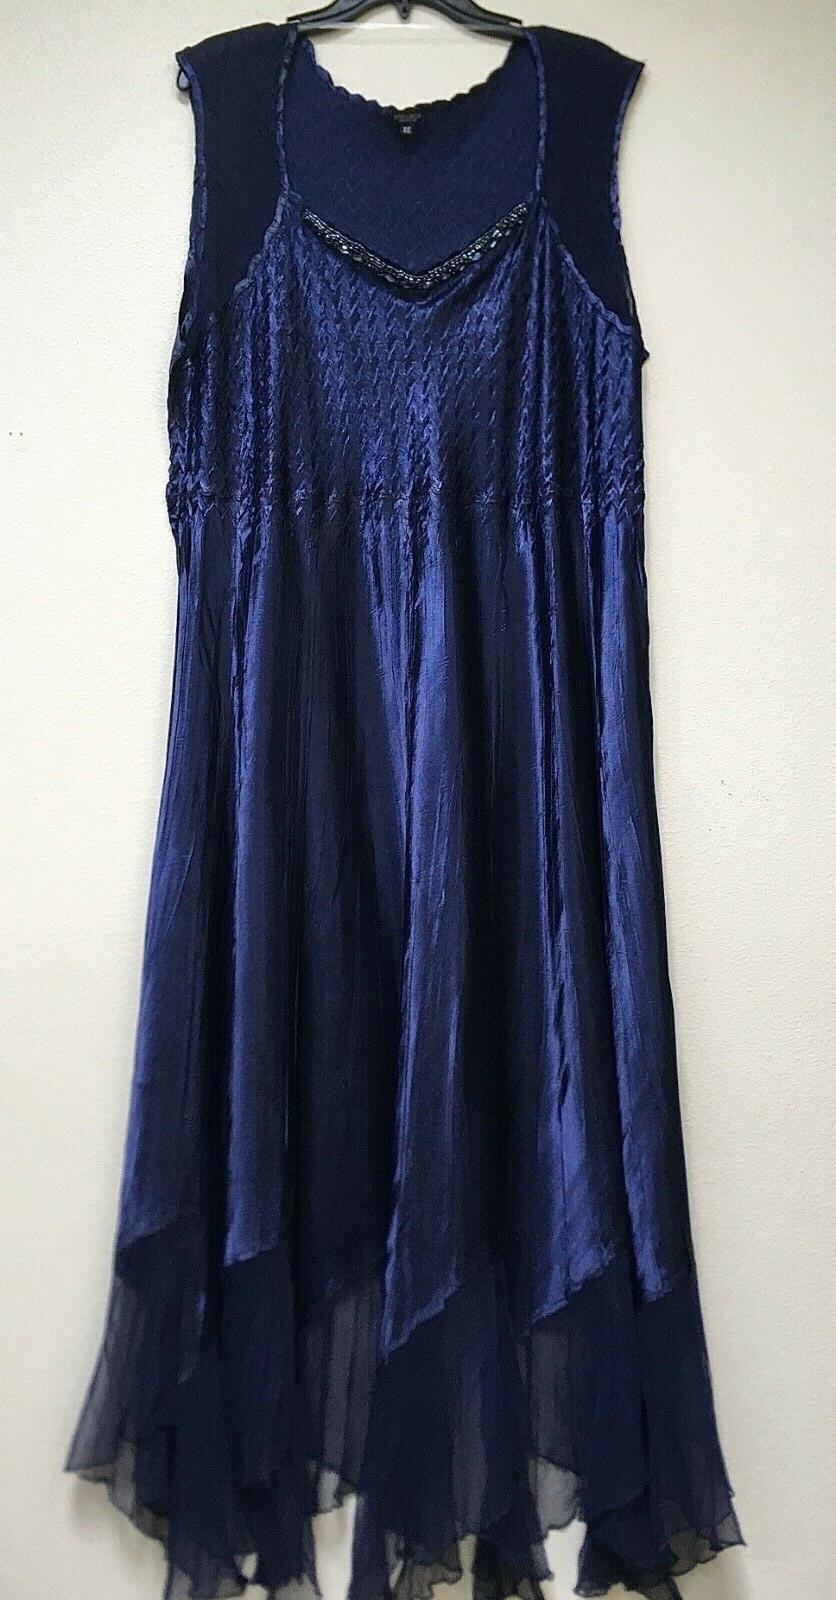 Komarov Embellished Chiffon Dress With Plus